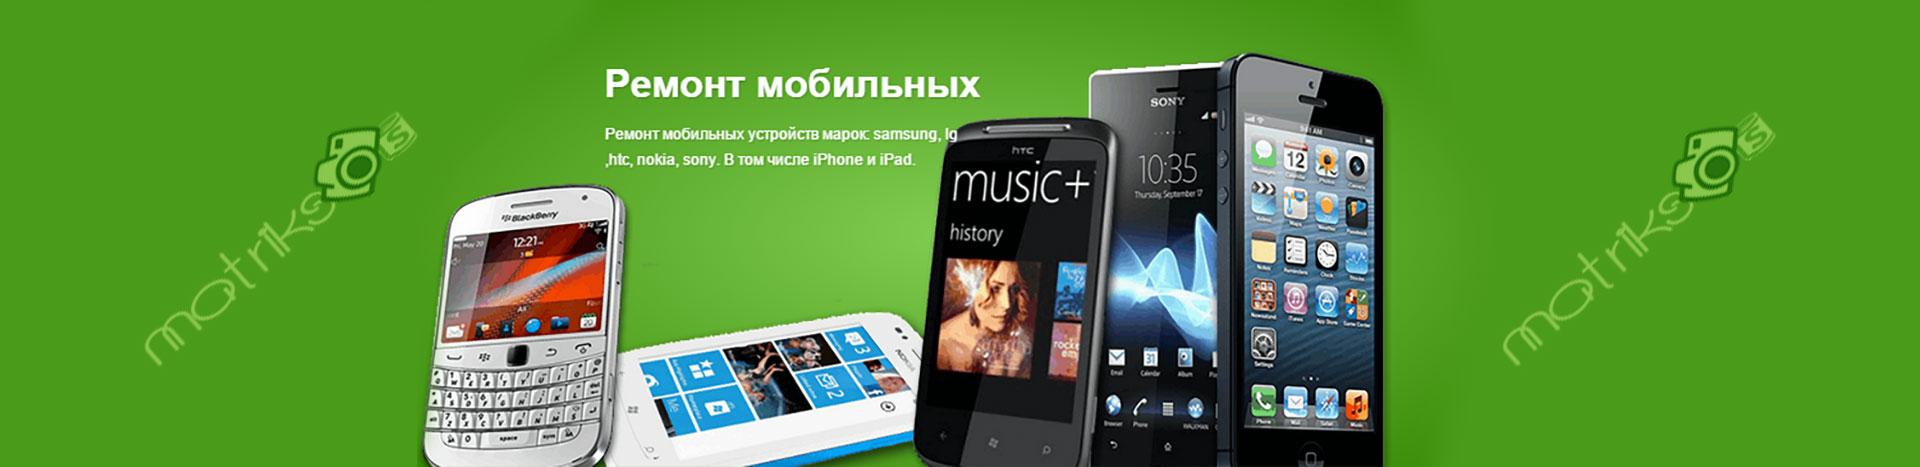 Сервисный центр sony горбушкин двор - ремонт в Москве icom ремонт